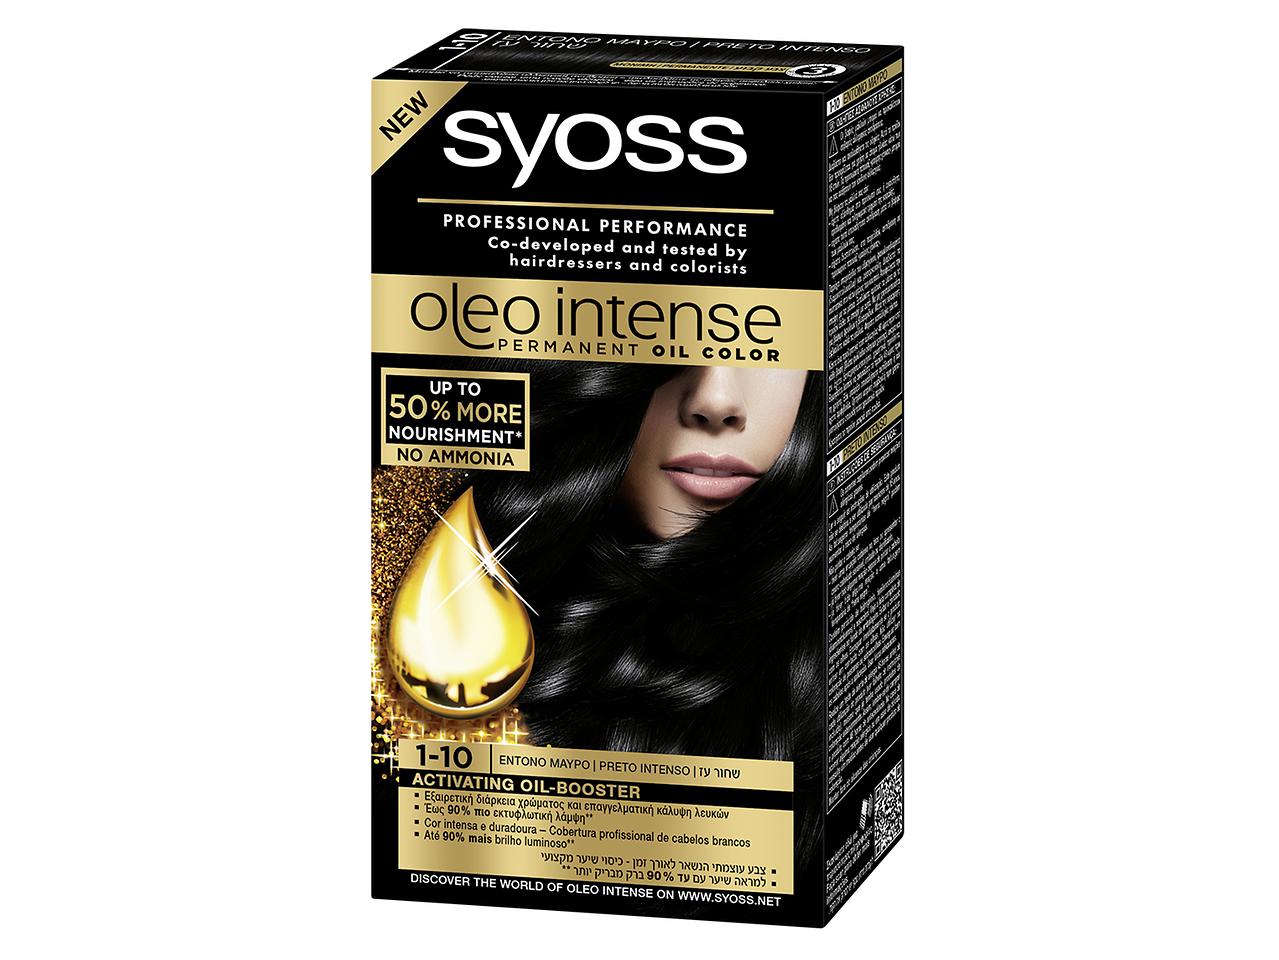 Syoss Oleo Intense 1-10 Preto intenso